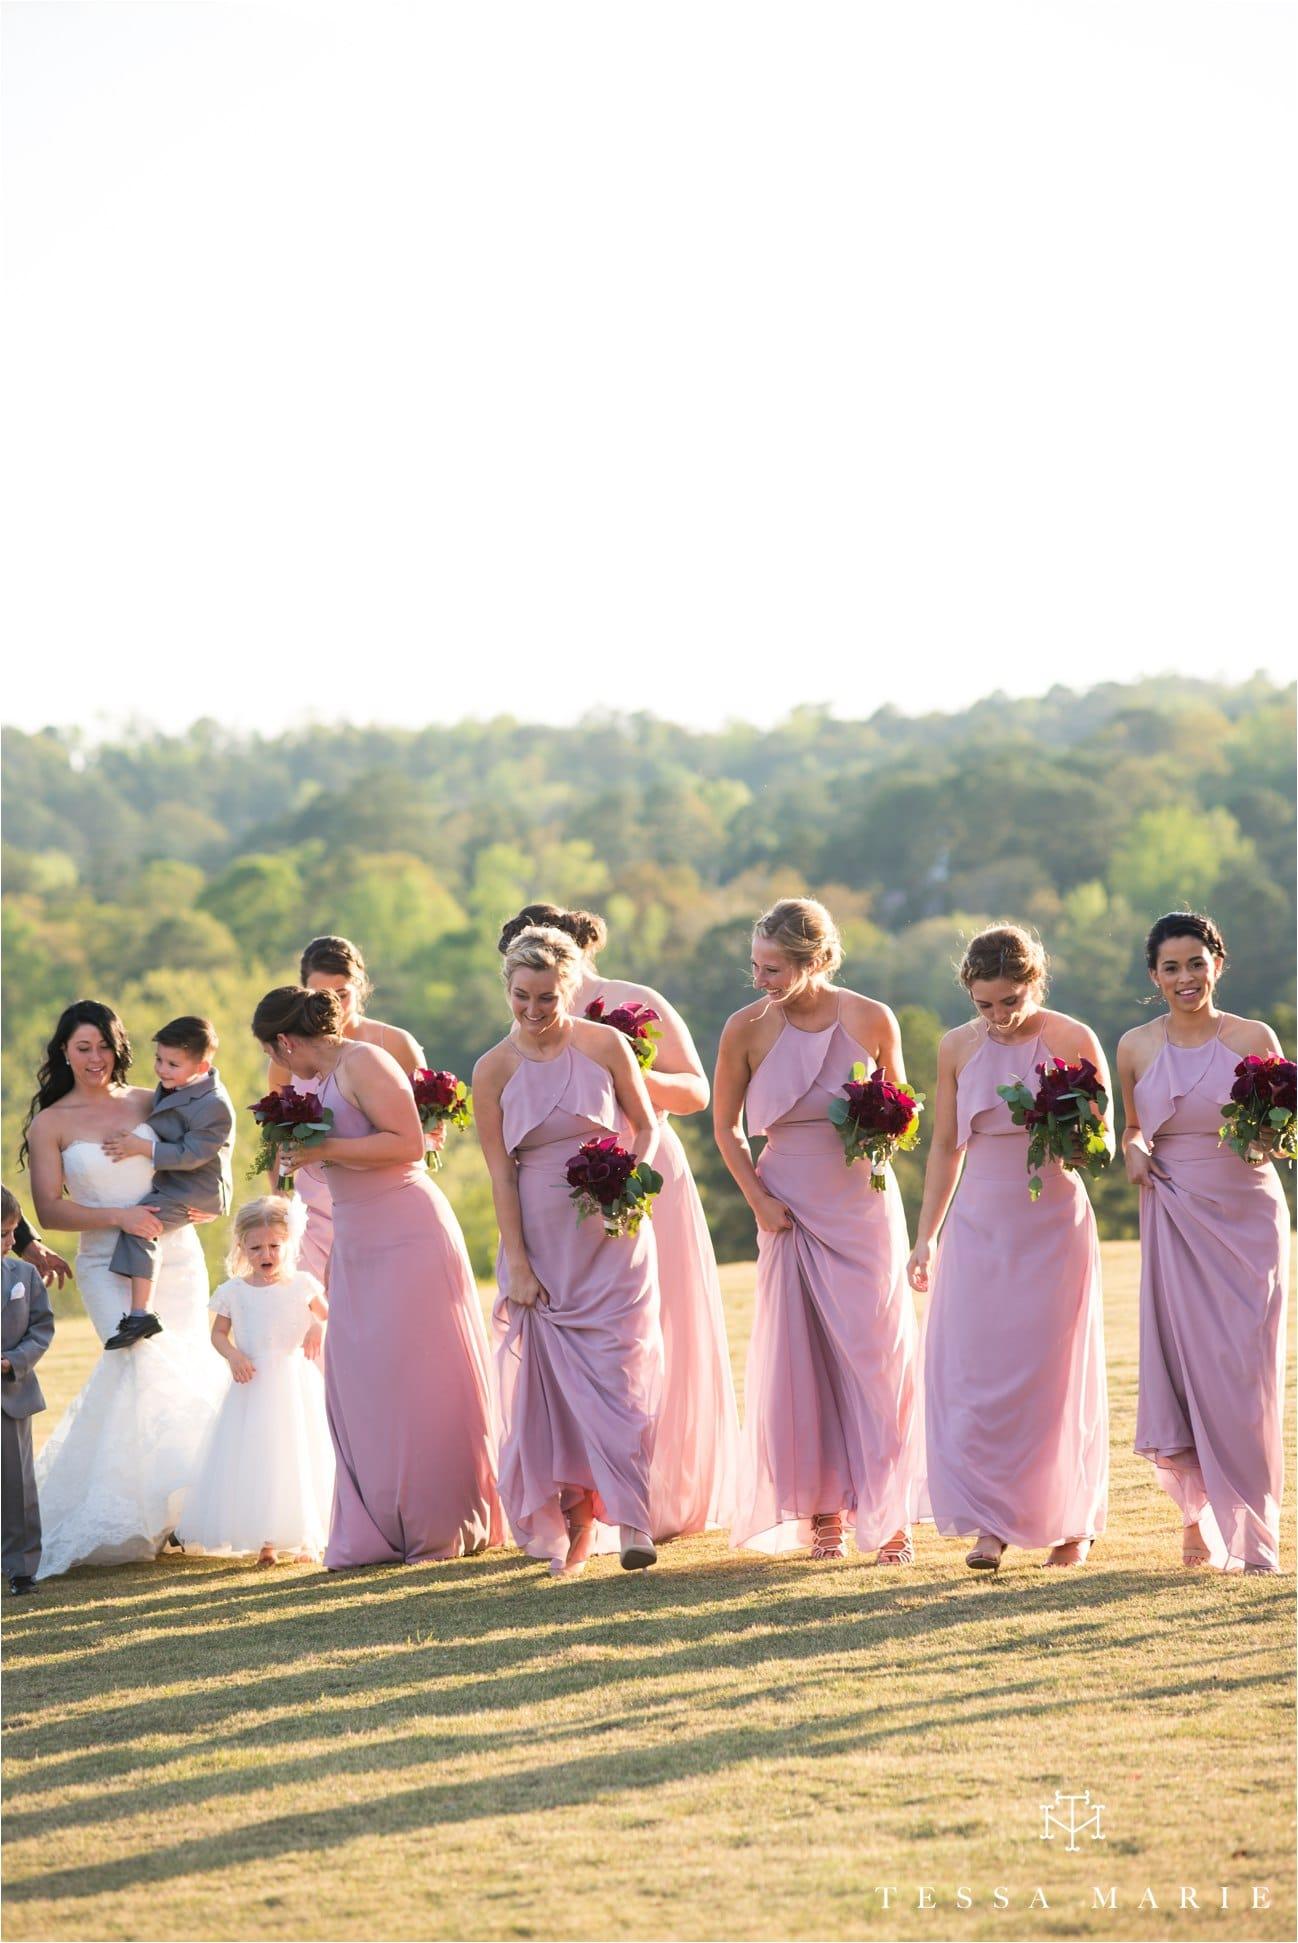 tessa_marie_weddings_rivermill_event_centere_candid_outdoor_wedding_photos_0265